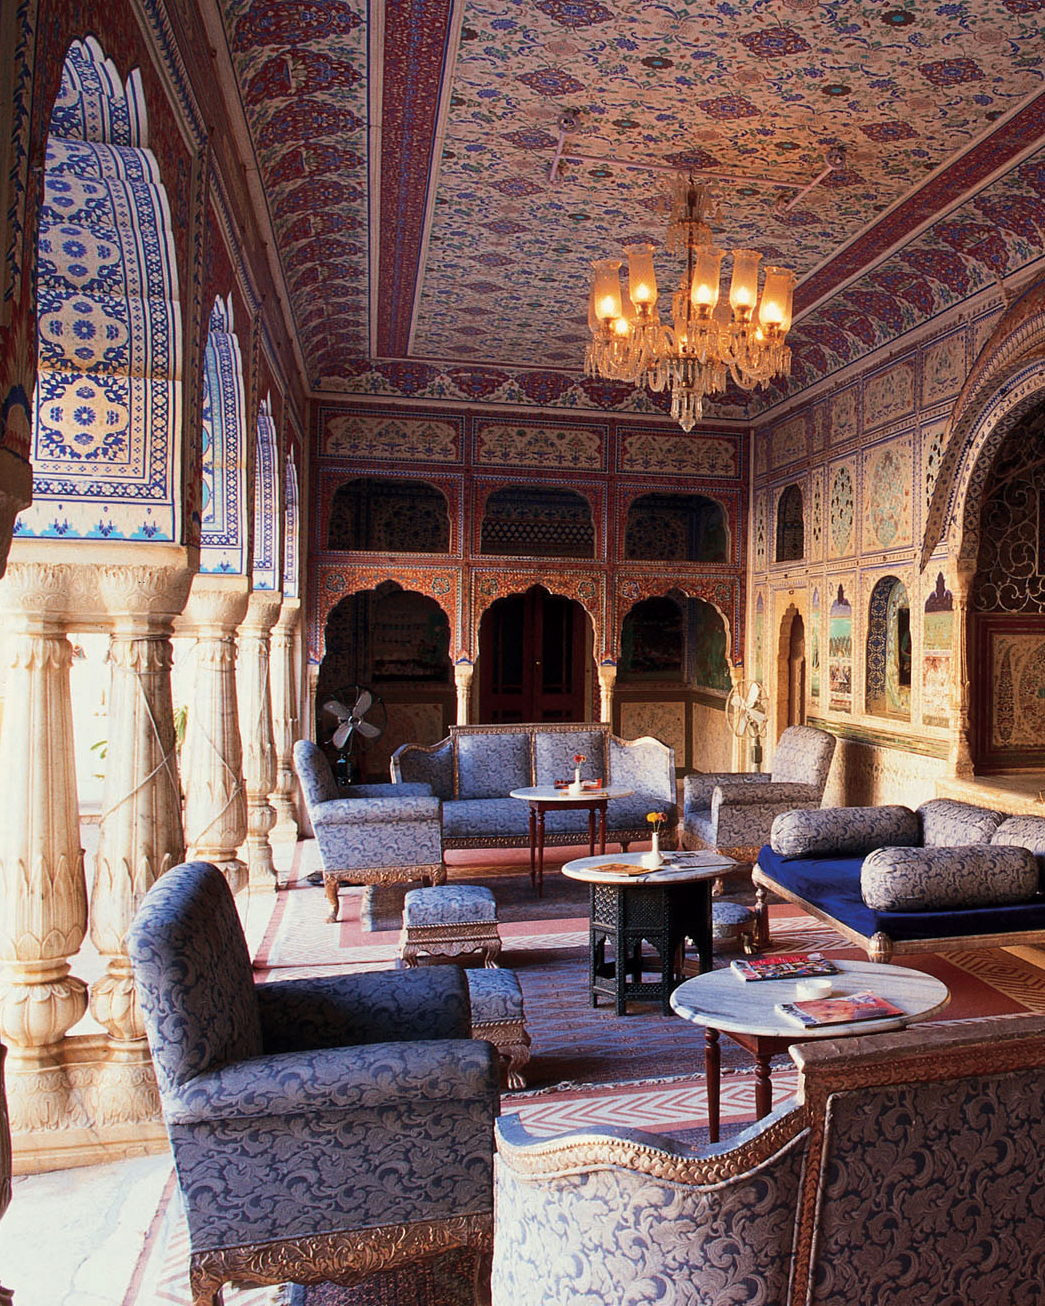 mr-mrs-smith-travel-hotels-wd0413-samode-palace-2.jpg